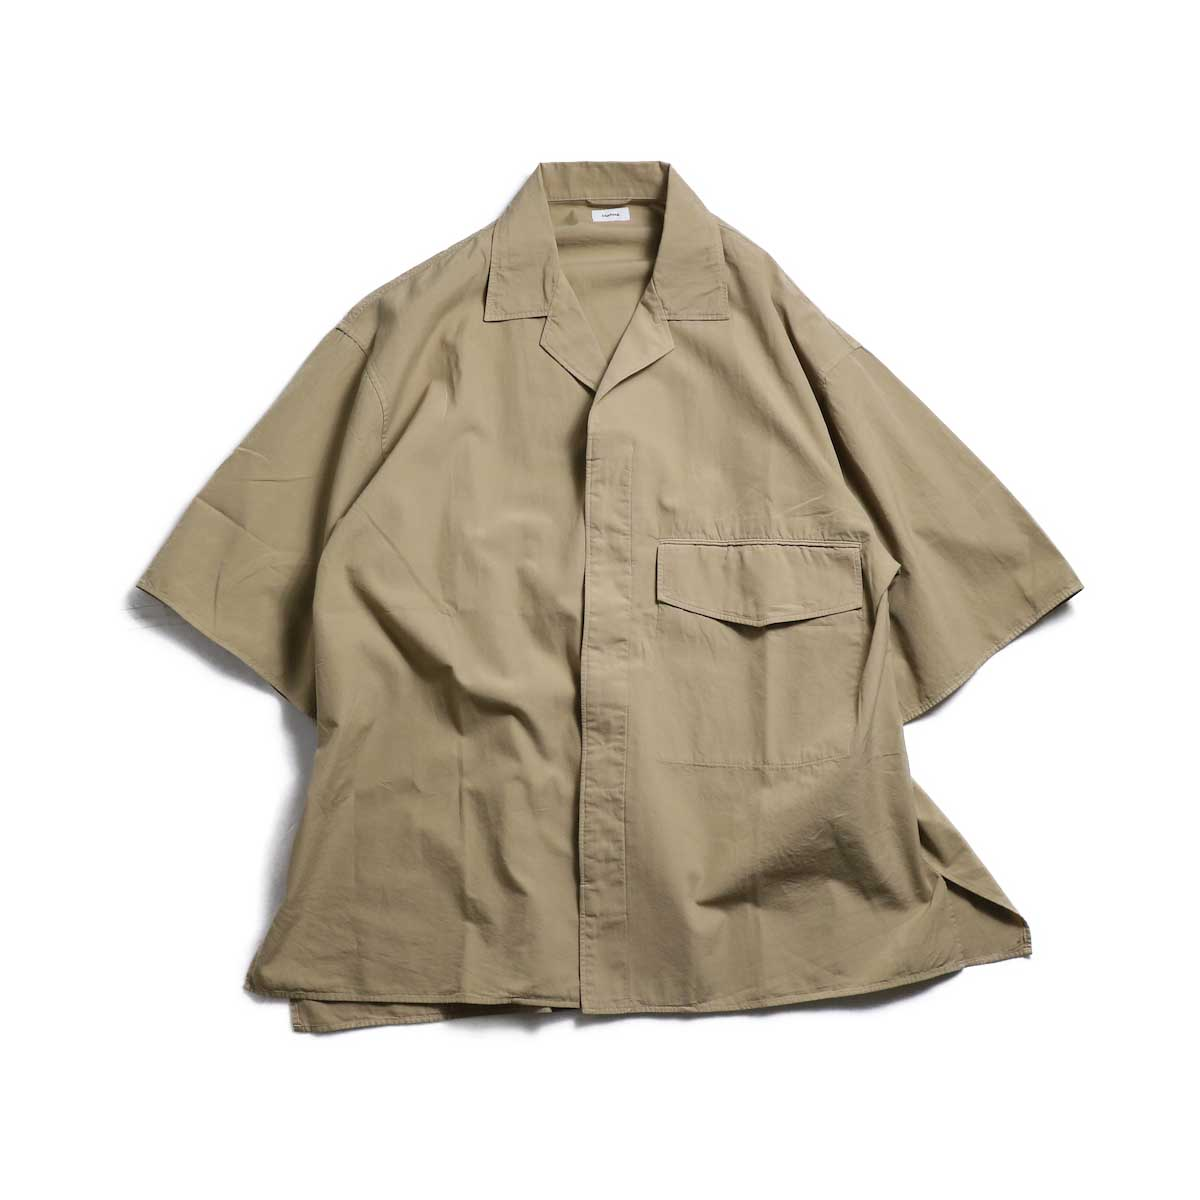 blurhms / Polish Chambray Wide Sleeve Box Shirt -Beige 正面